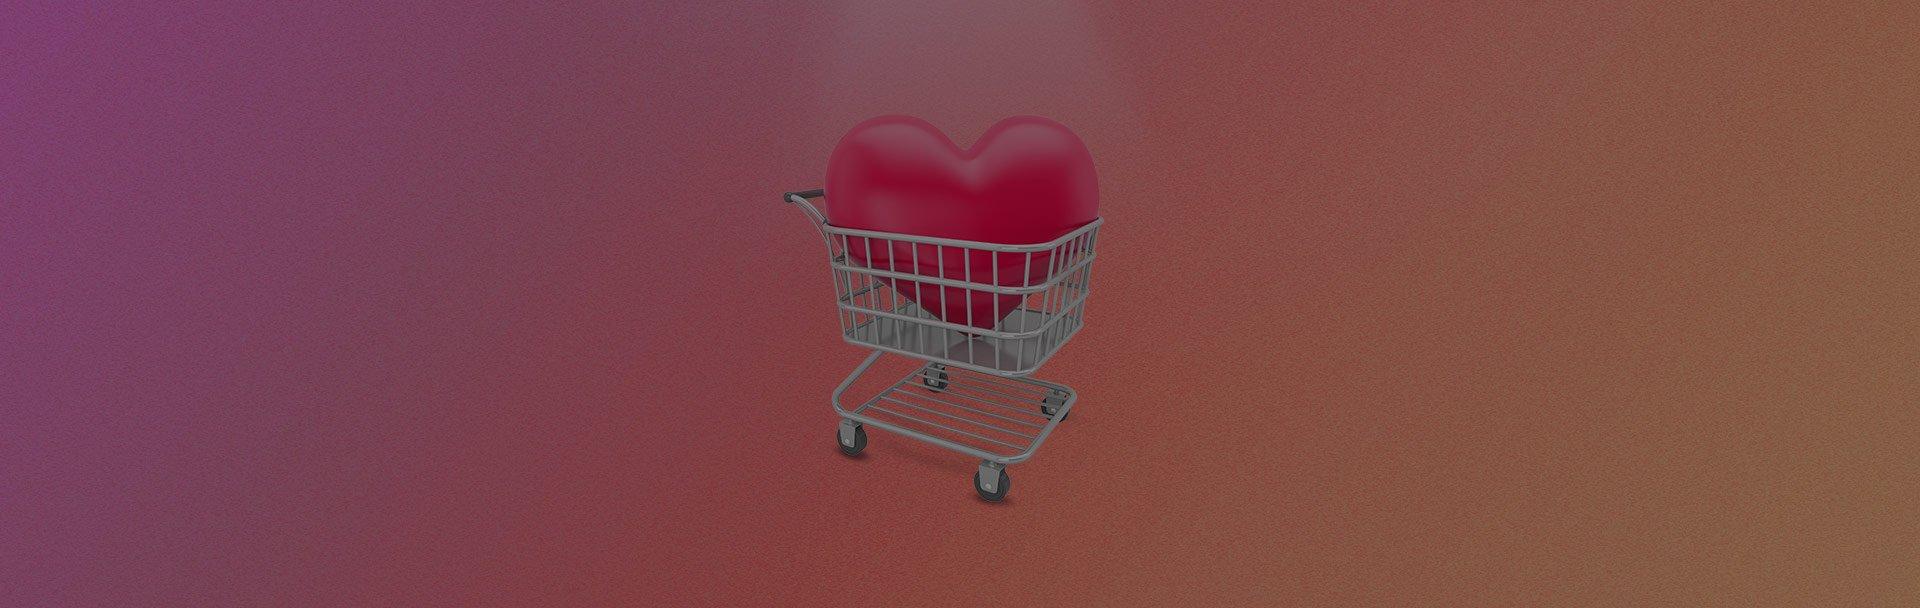 solucionweb-banner-blog-estrategia-digital-inbound-redes-sociales-blog-emociones-estrategia-digital.jpg